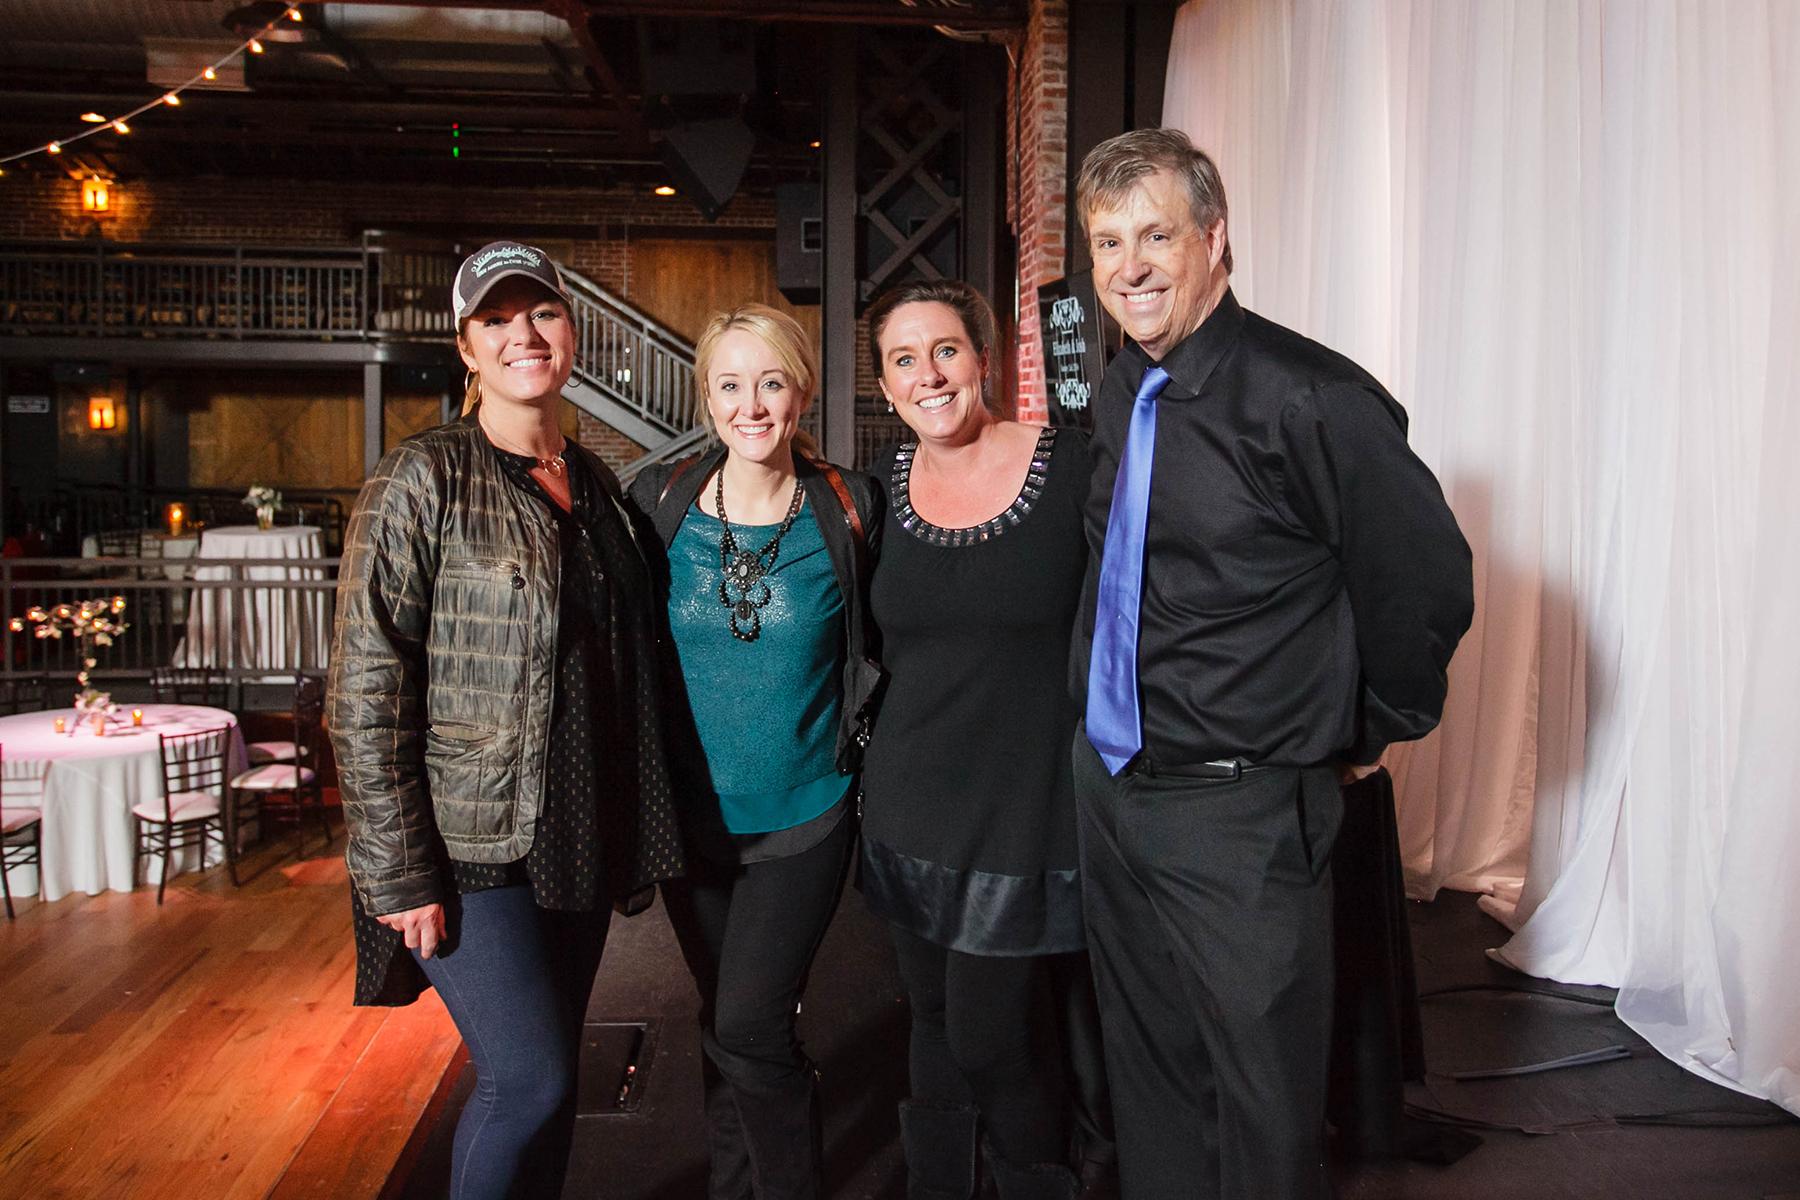 L-R: Suzanne Martensen,Stems & Styles;Angela Karen,Angela Karen Photography;Danny Brewer, Feel the Beat Entertainment